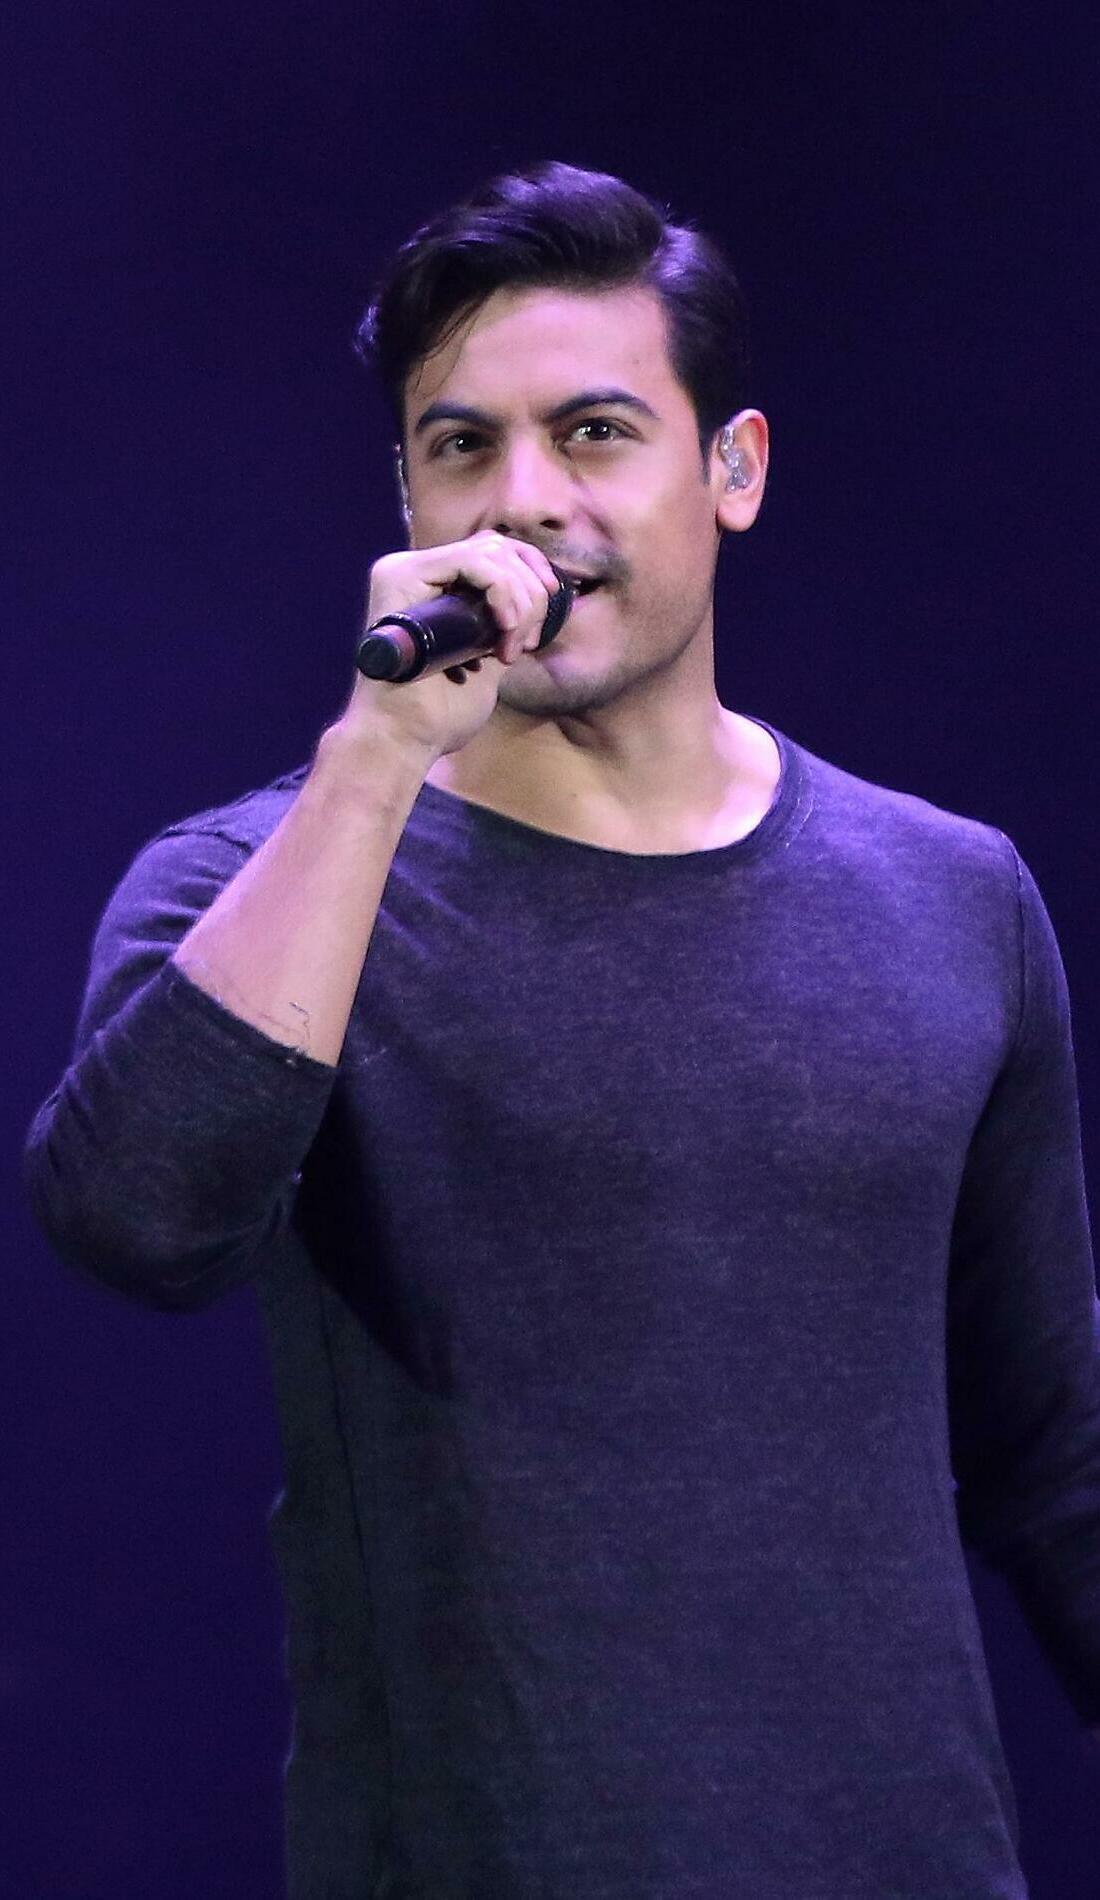 A Carlos Rivera live event